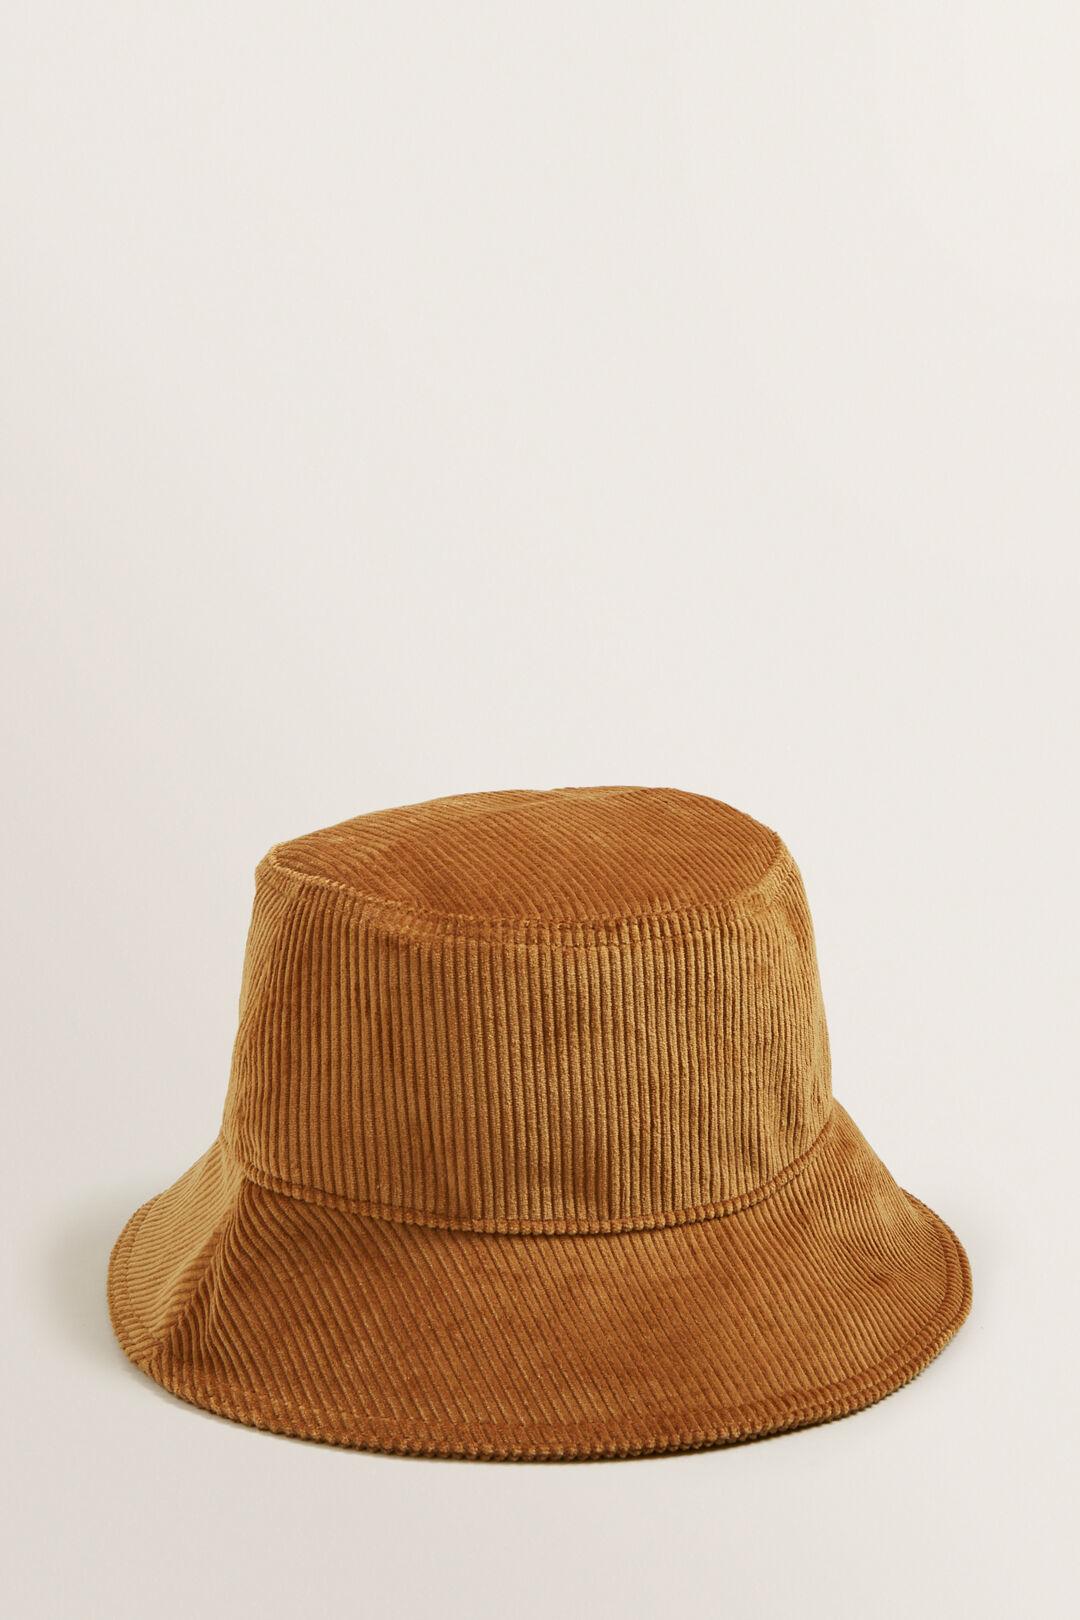 Cord Bucket Hat    hi-res